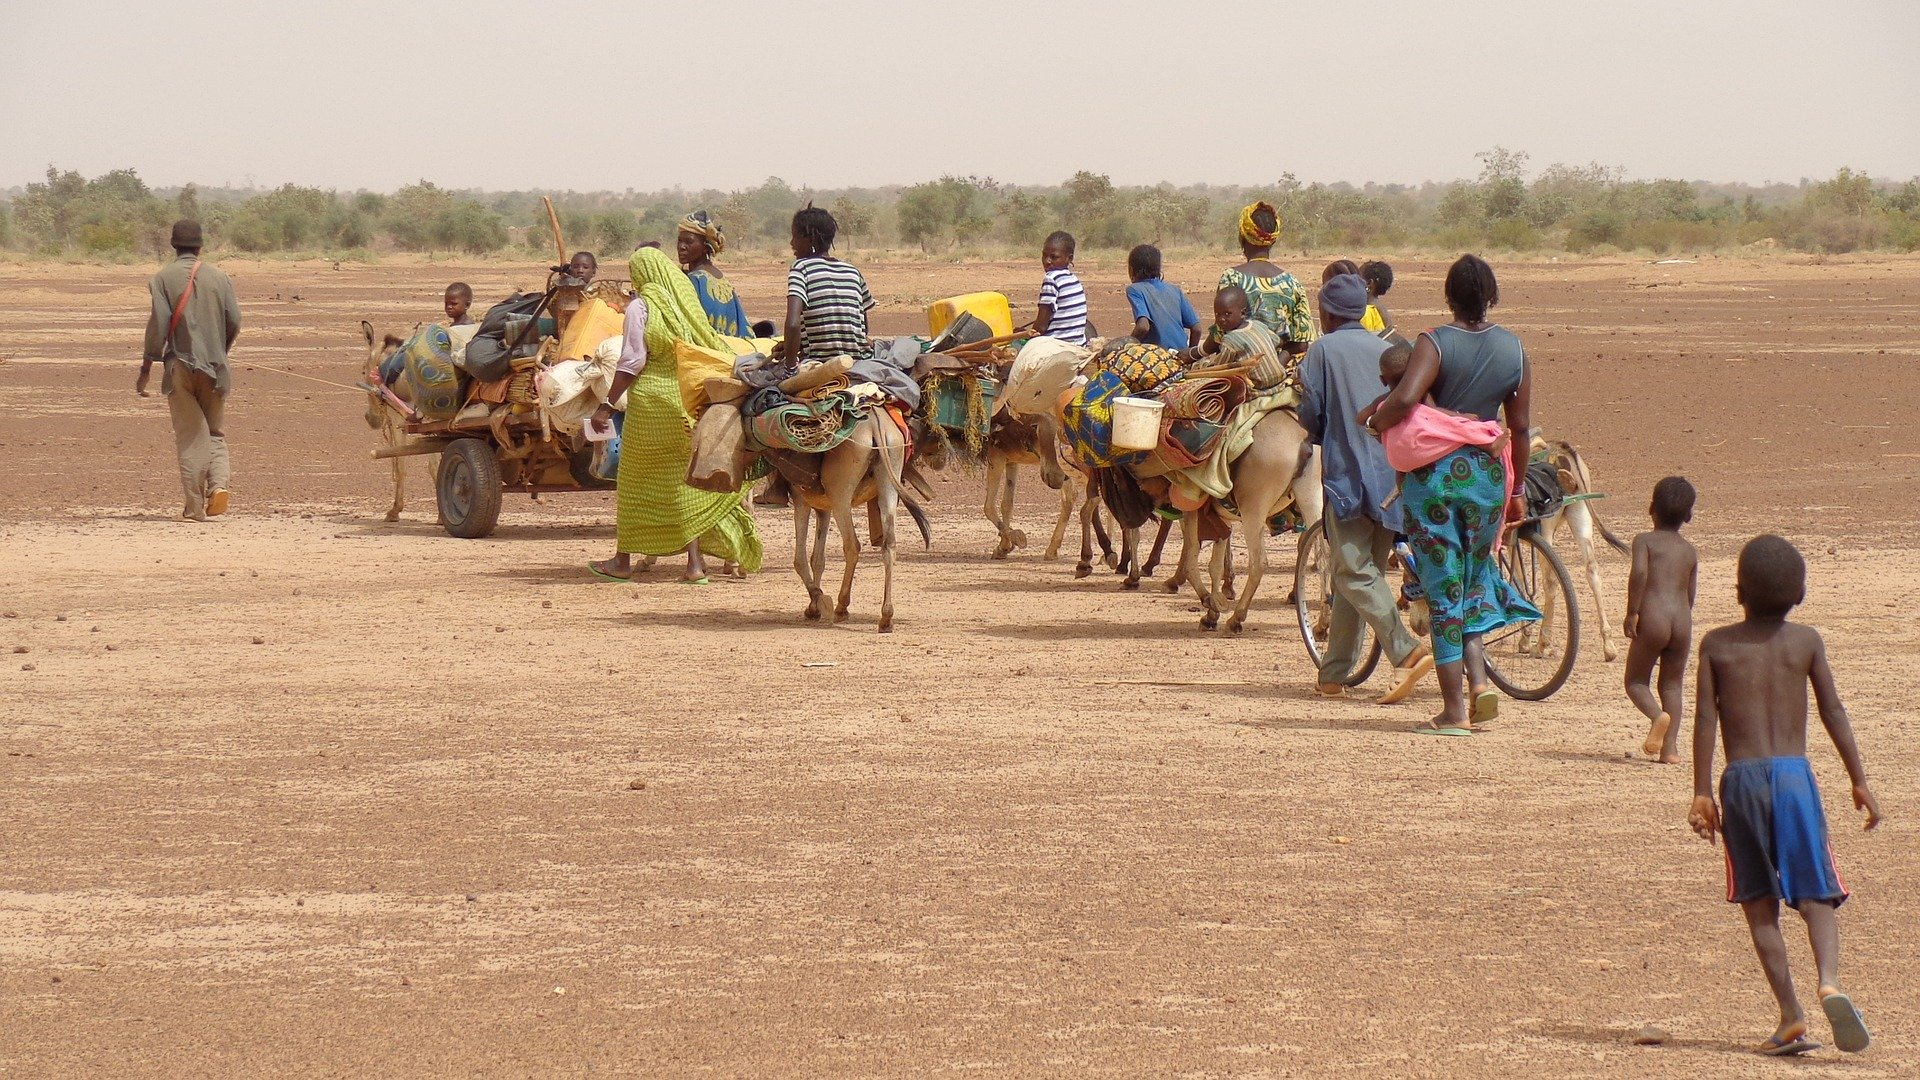 Endure International Sudan Refugees Image